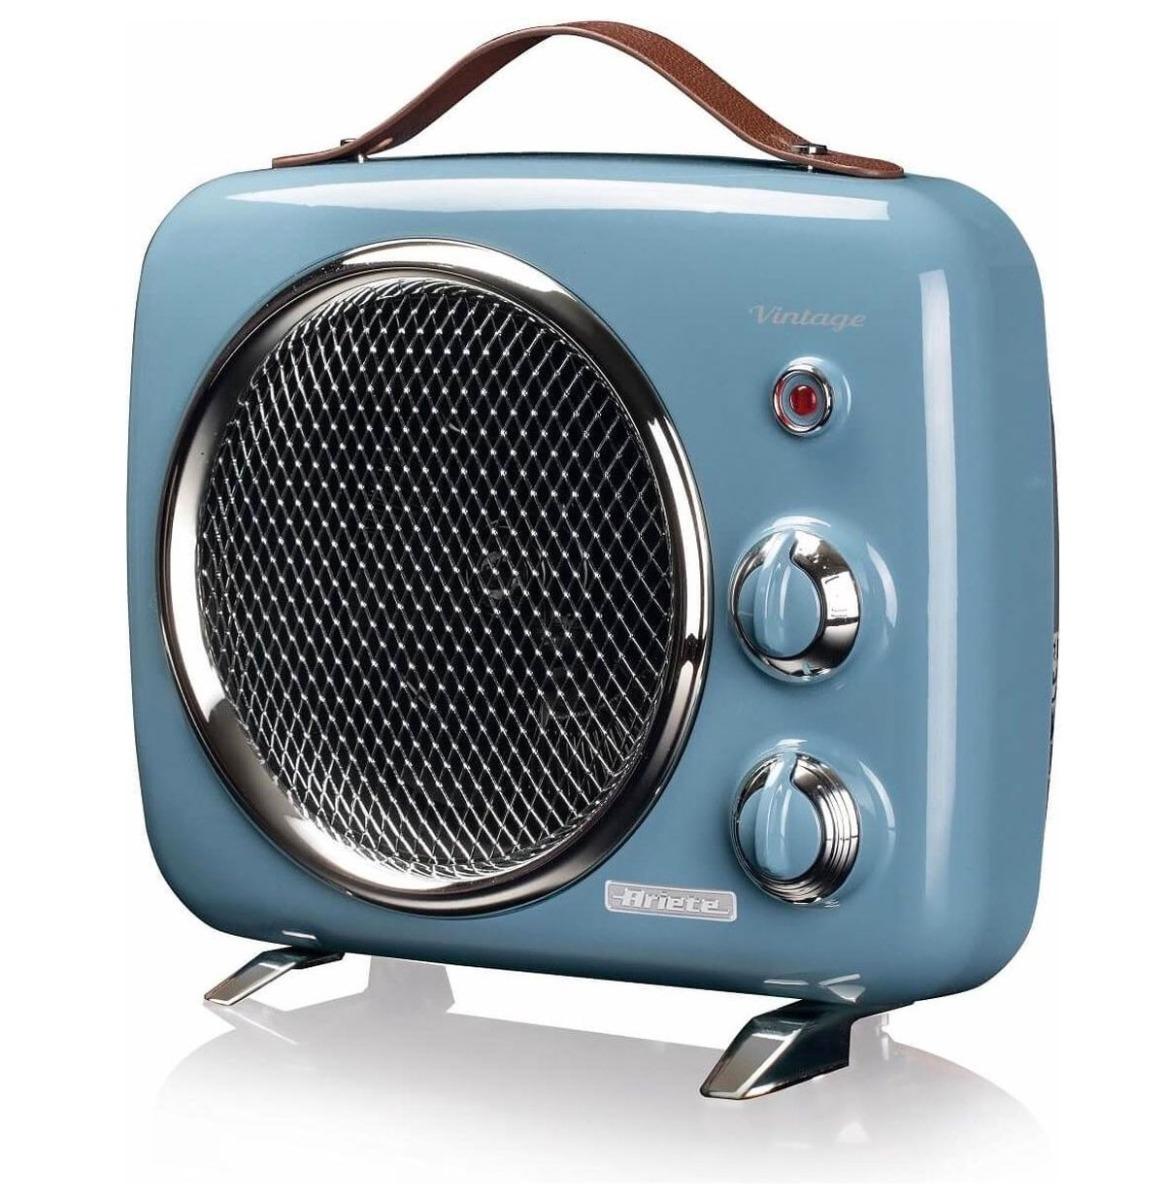 Ariete Vintage Draagbare Mini Heater en Ventilator - Blauw